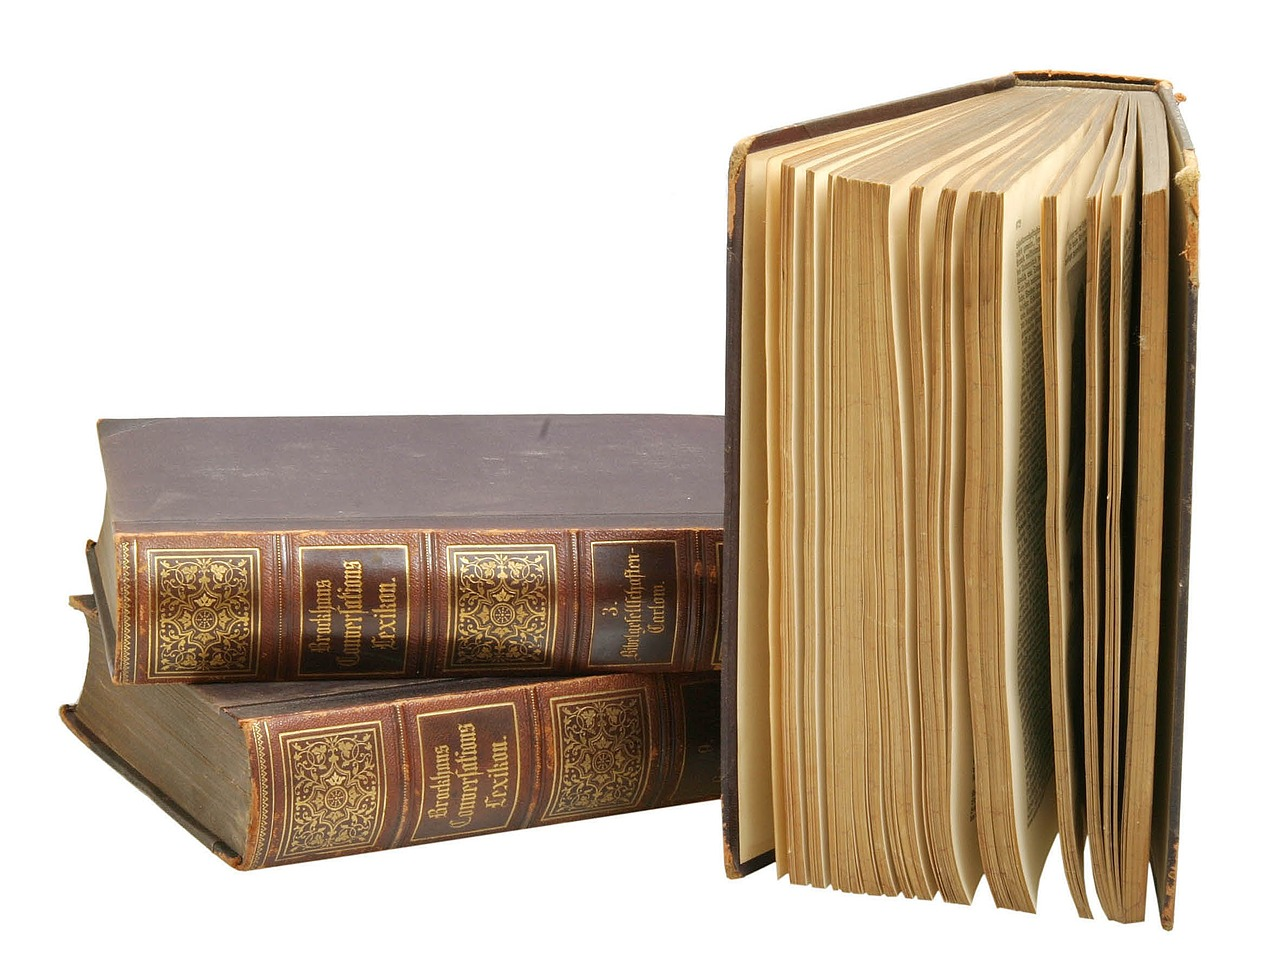 books-1211002_1280